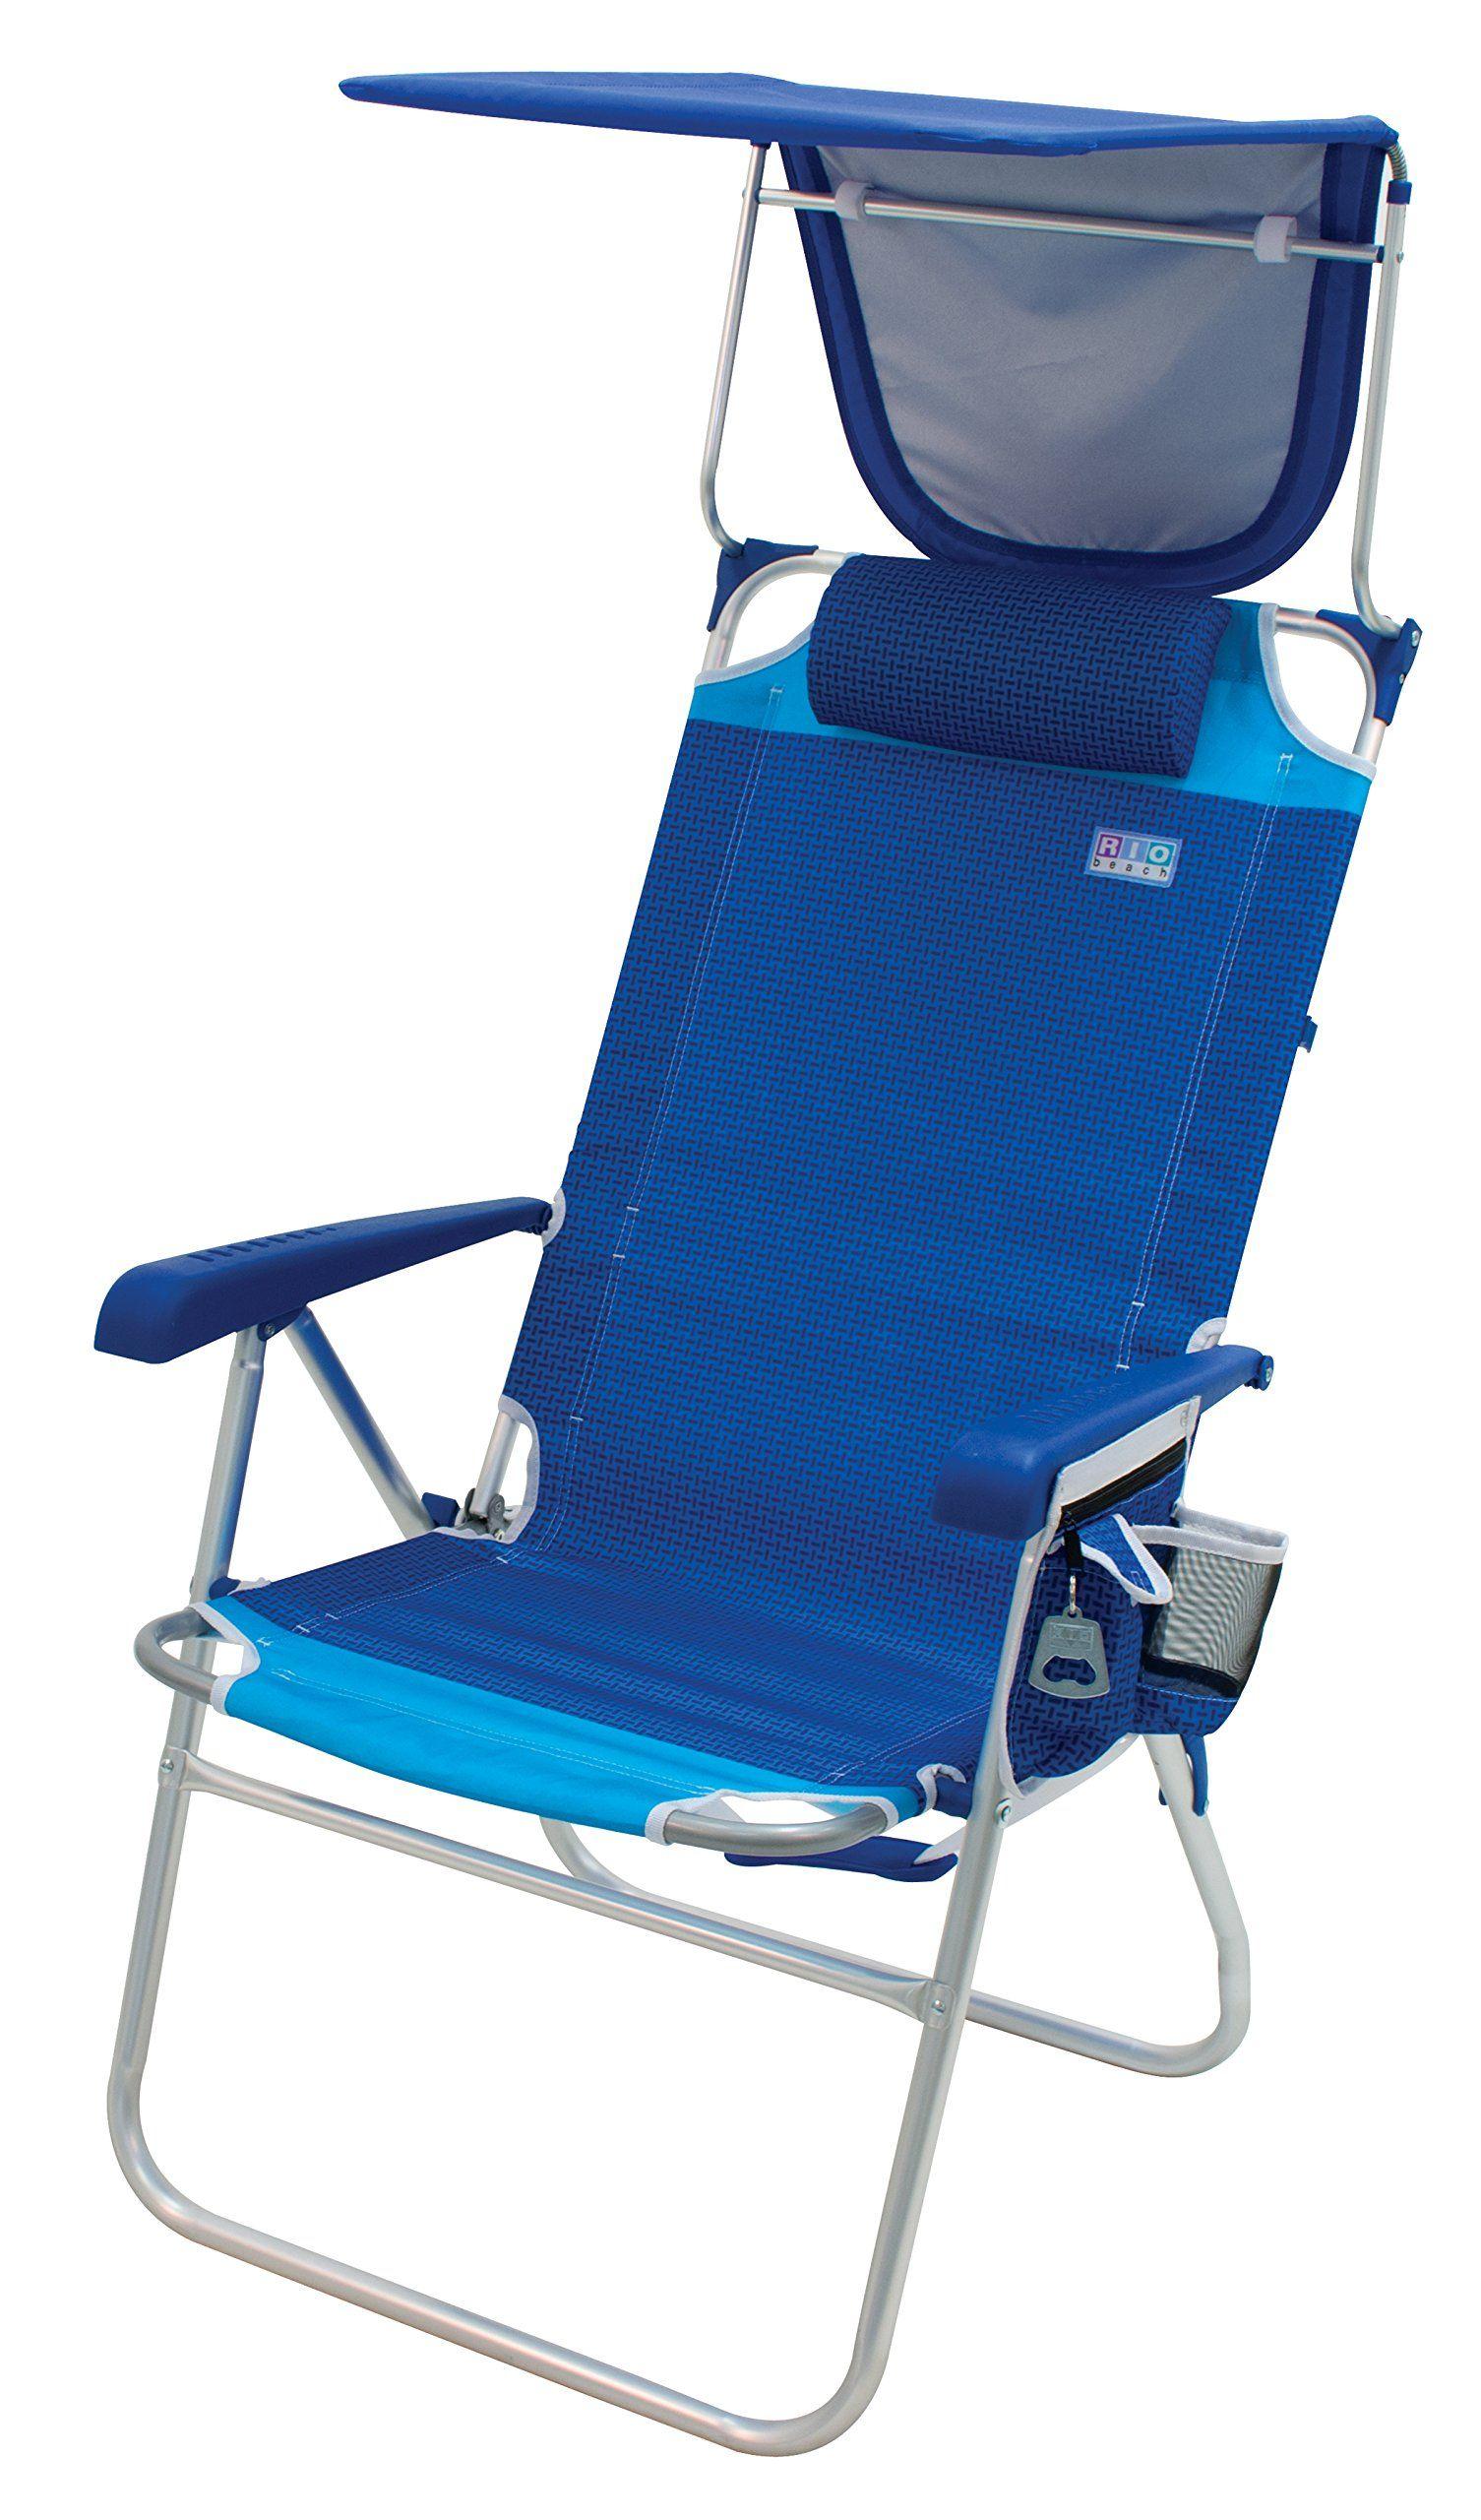 "RIO Beach HiBoy 17"" Extended Seat Height Folding Beach"